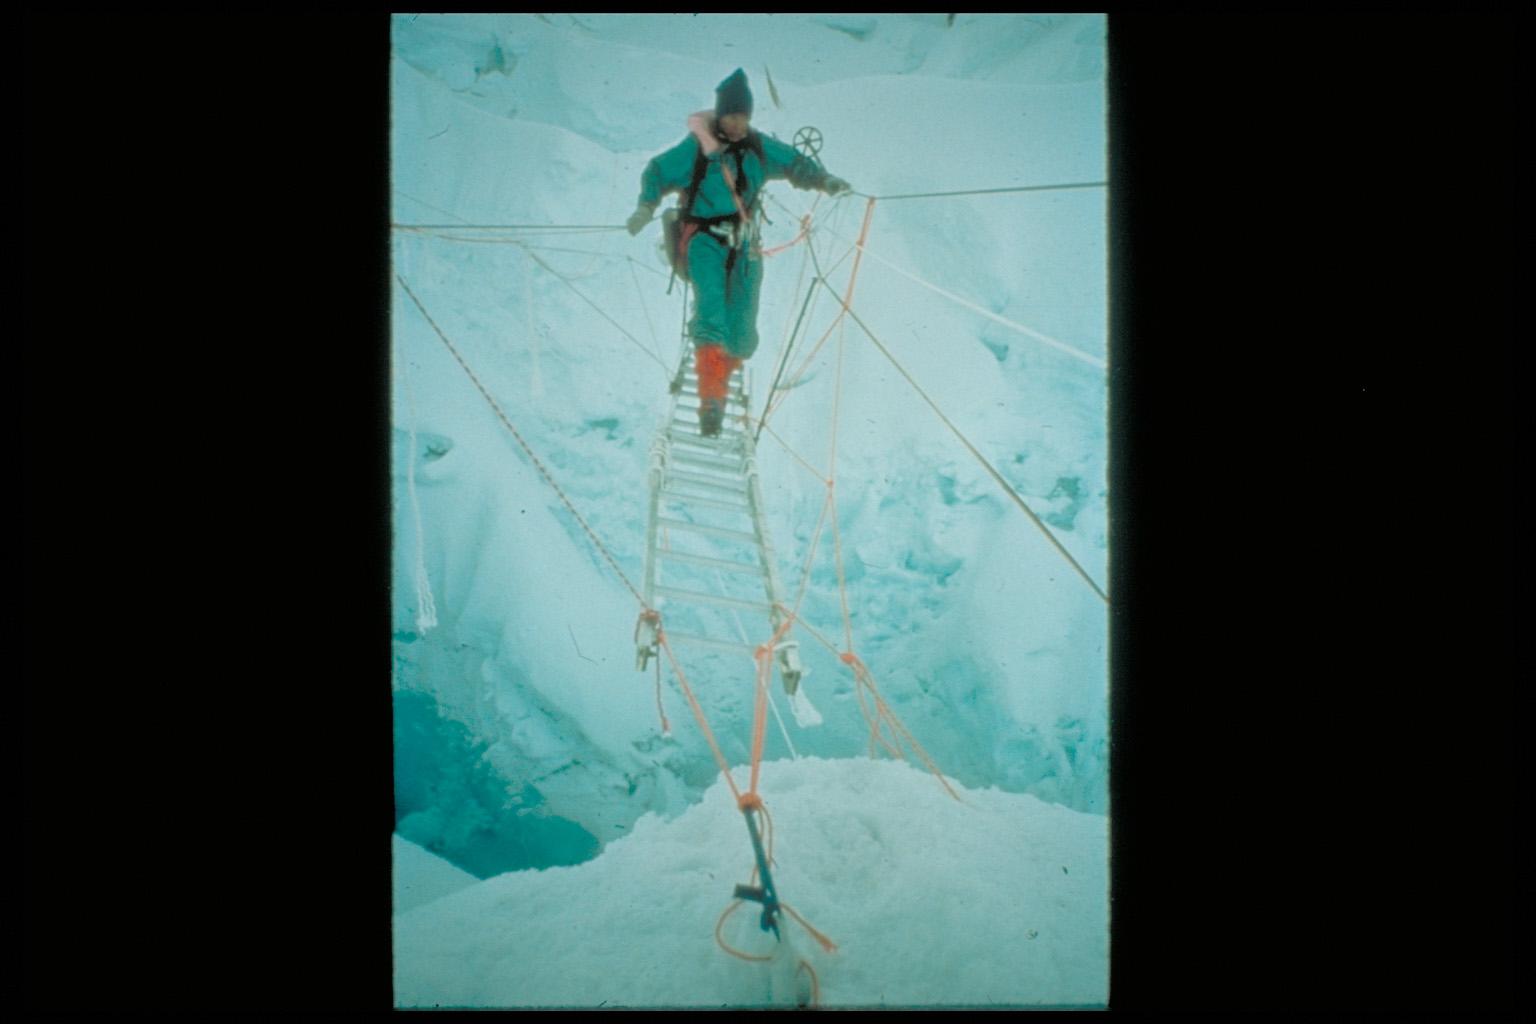 Ladder crossing on Mt. Everest